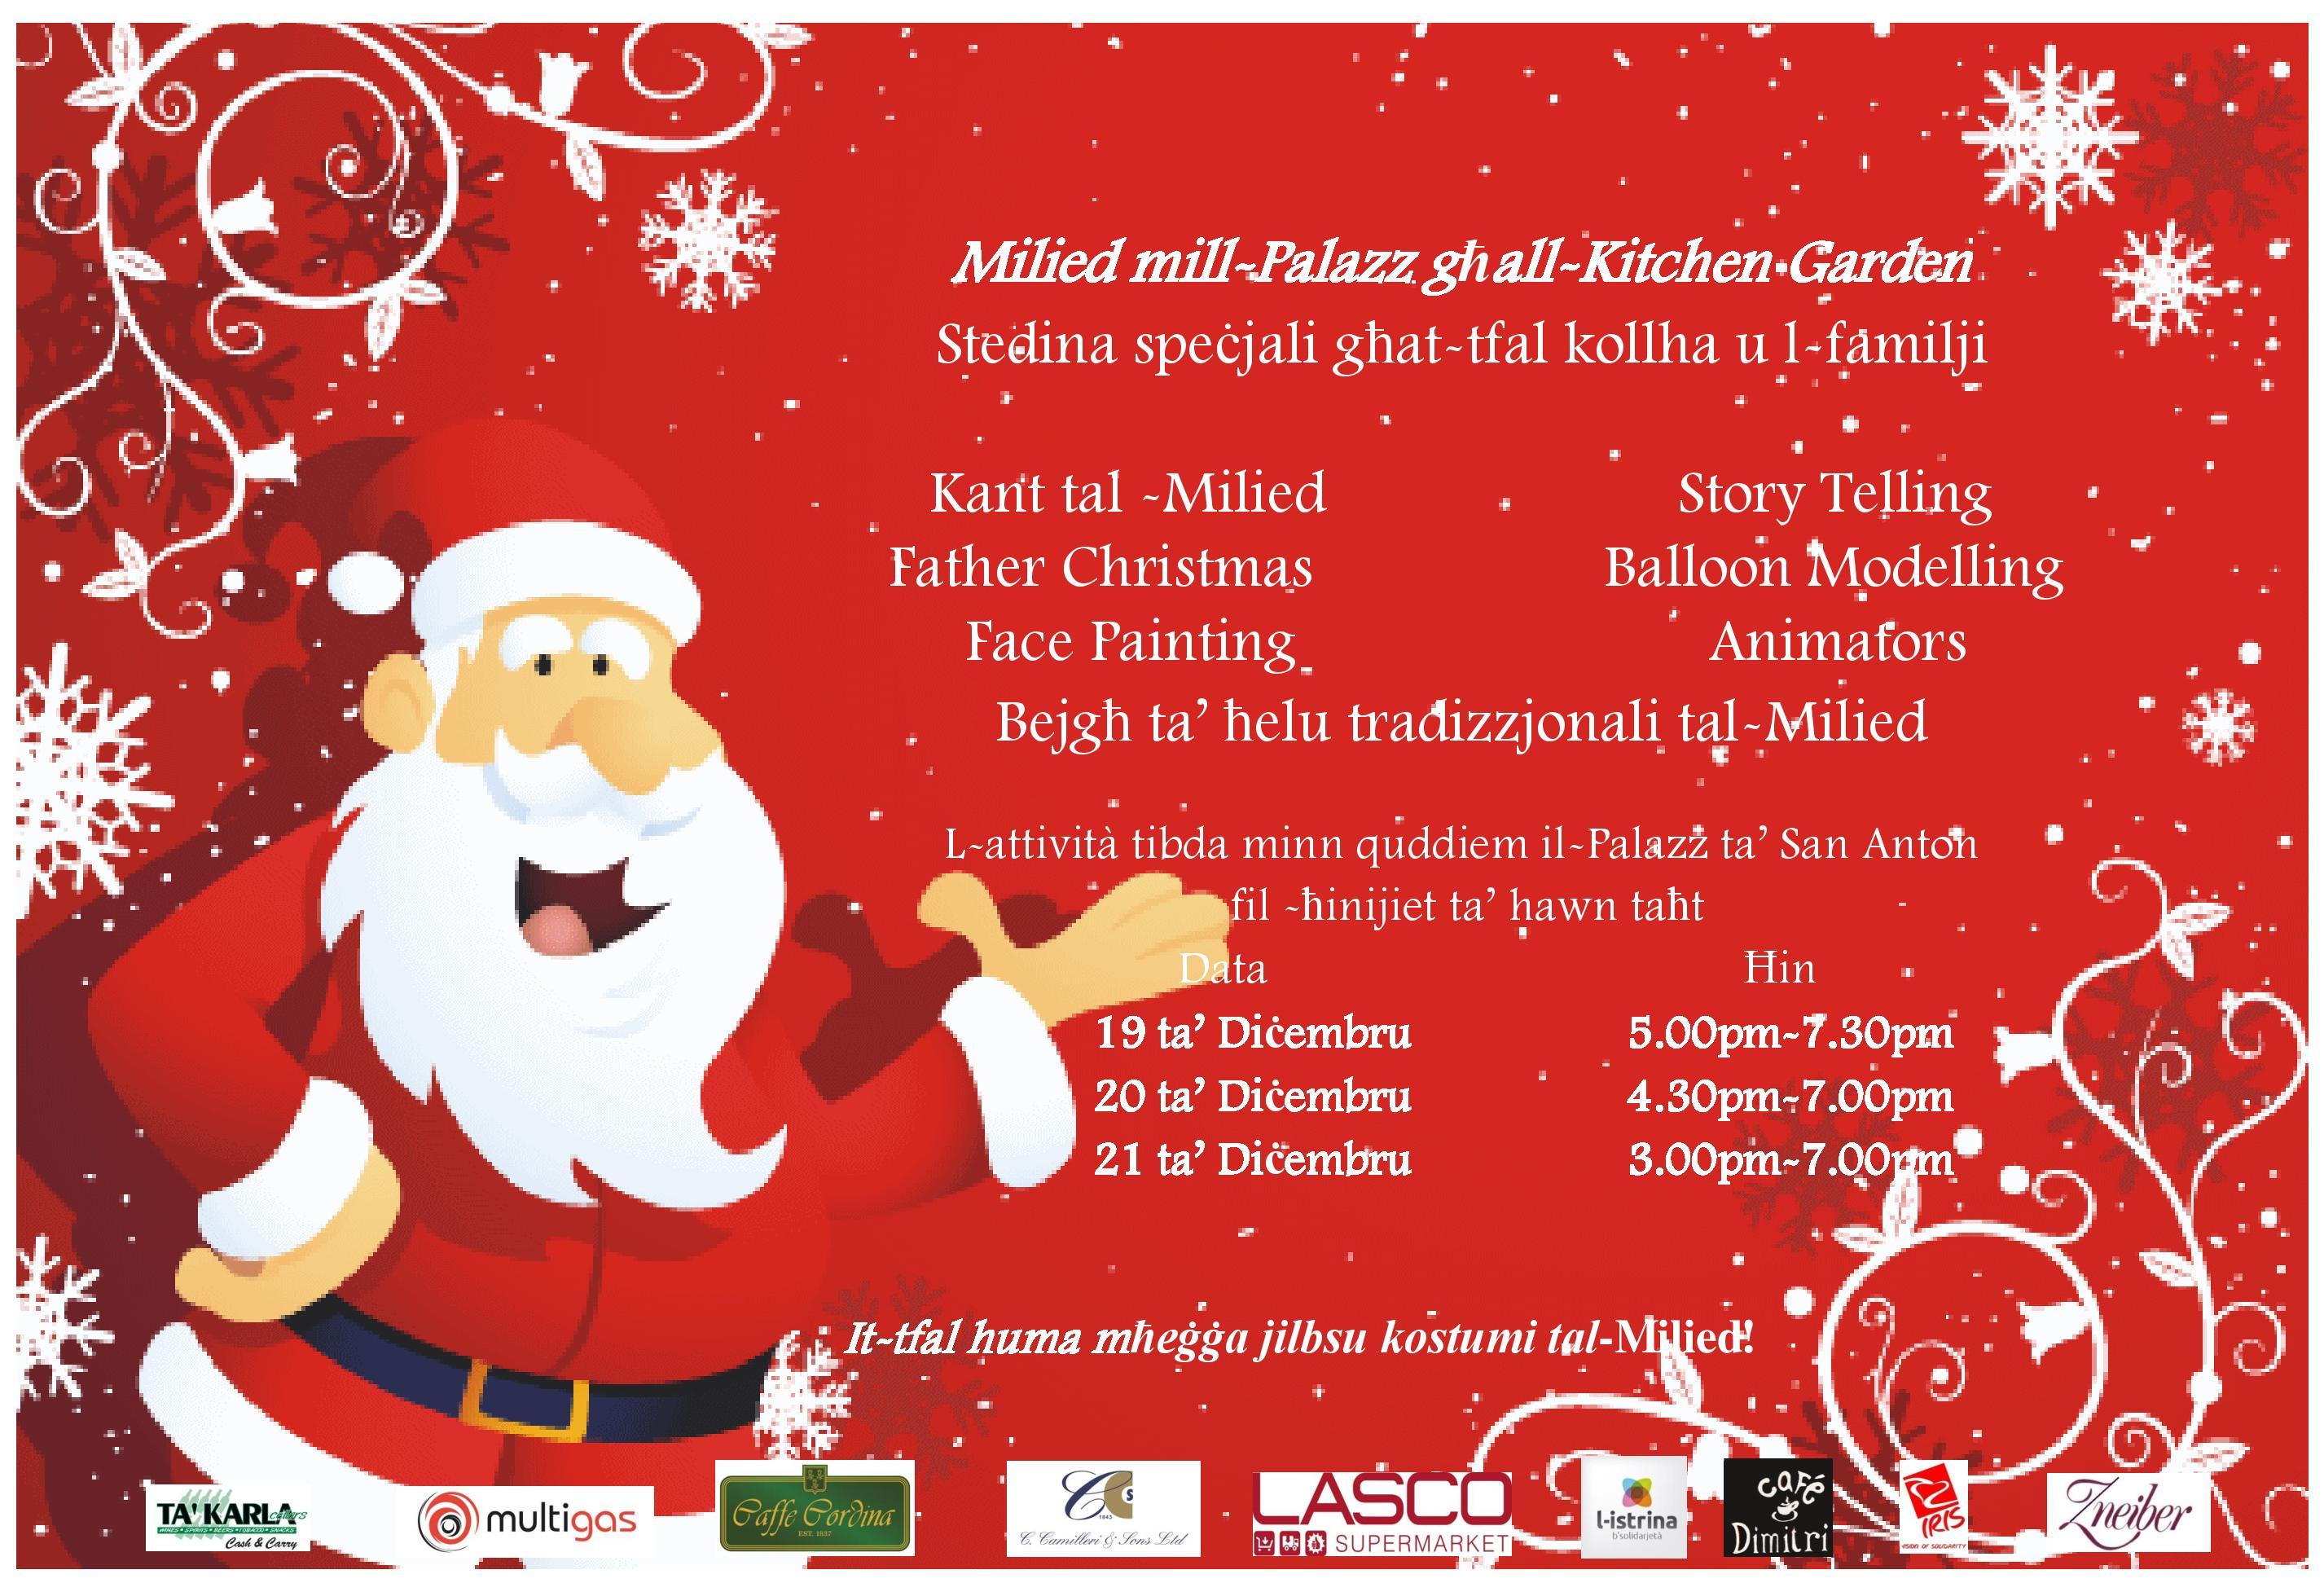 Milied mill-Palazz għall-Kitchen Garden Poster-page-001